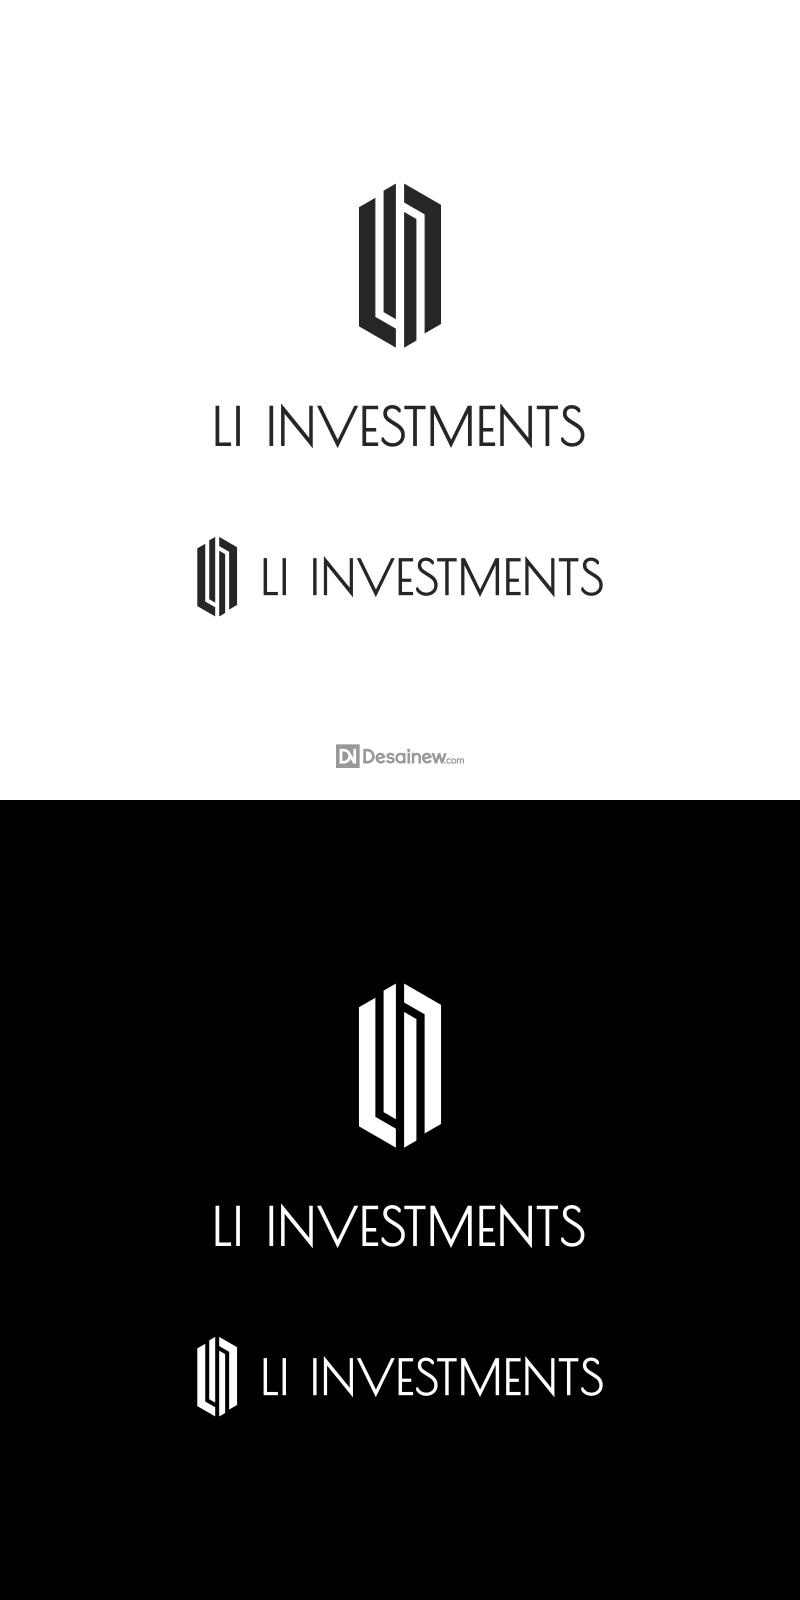 LI Investments Logo Design Project Portfolio Desainew Studio